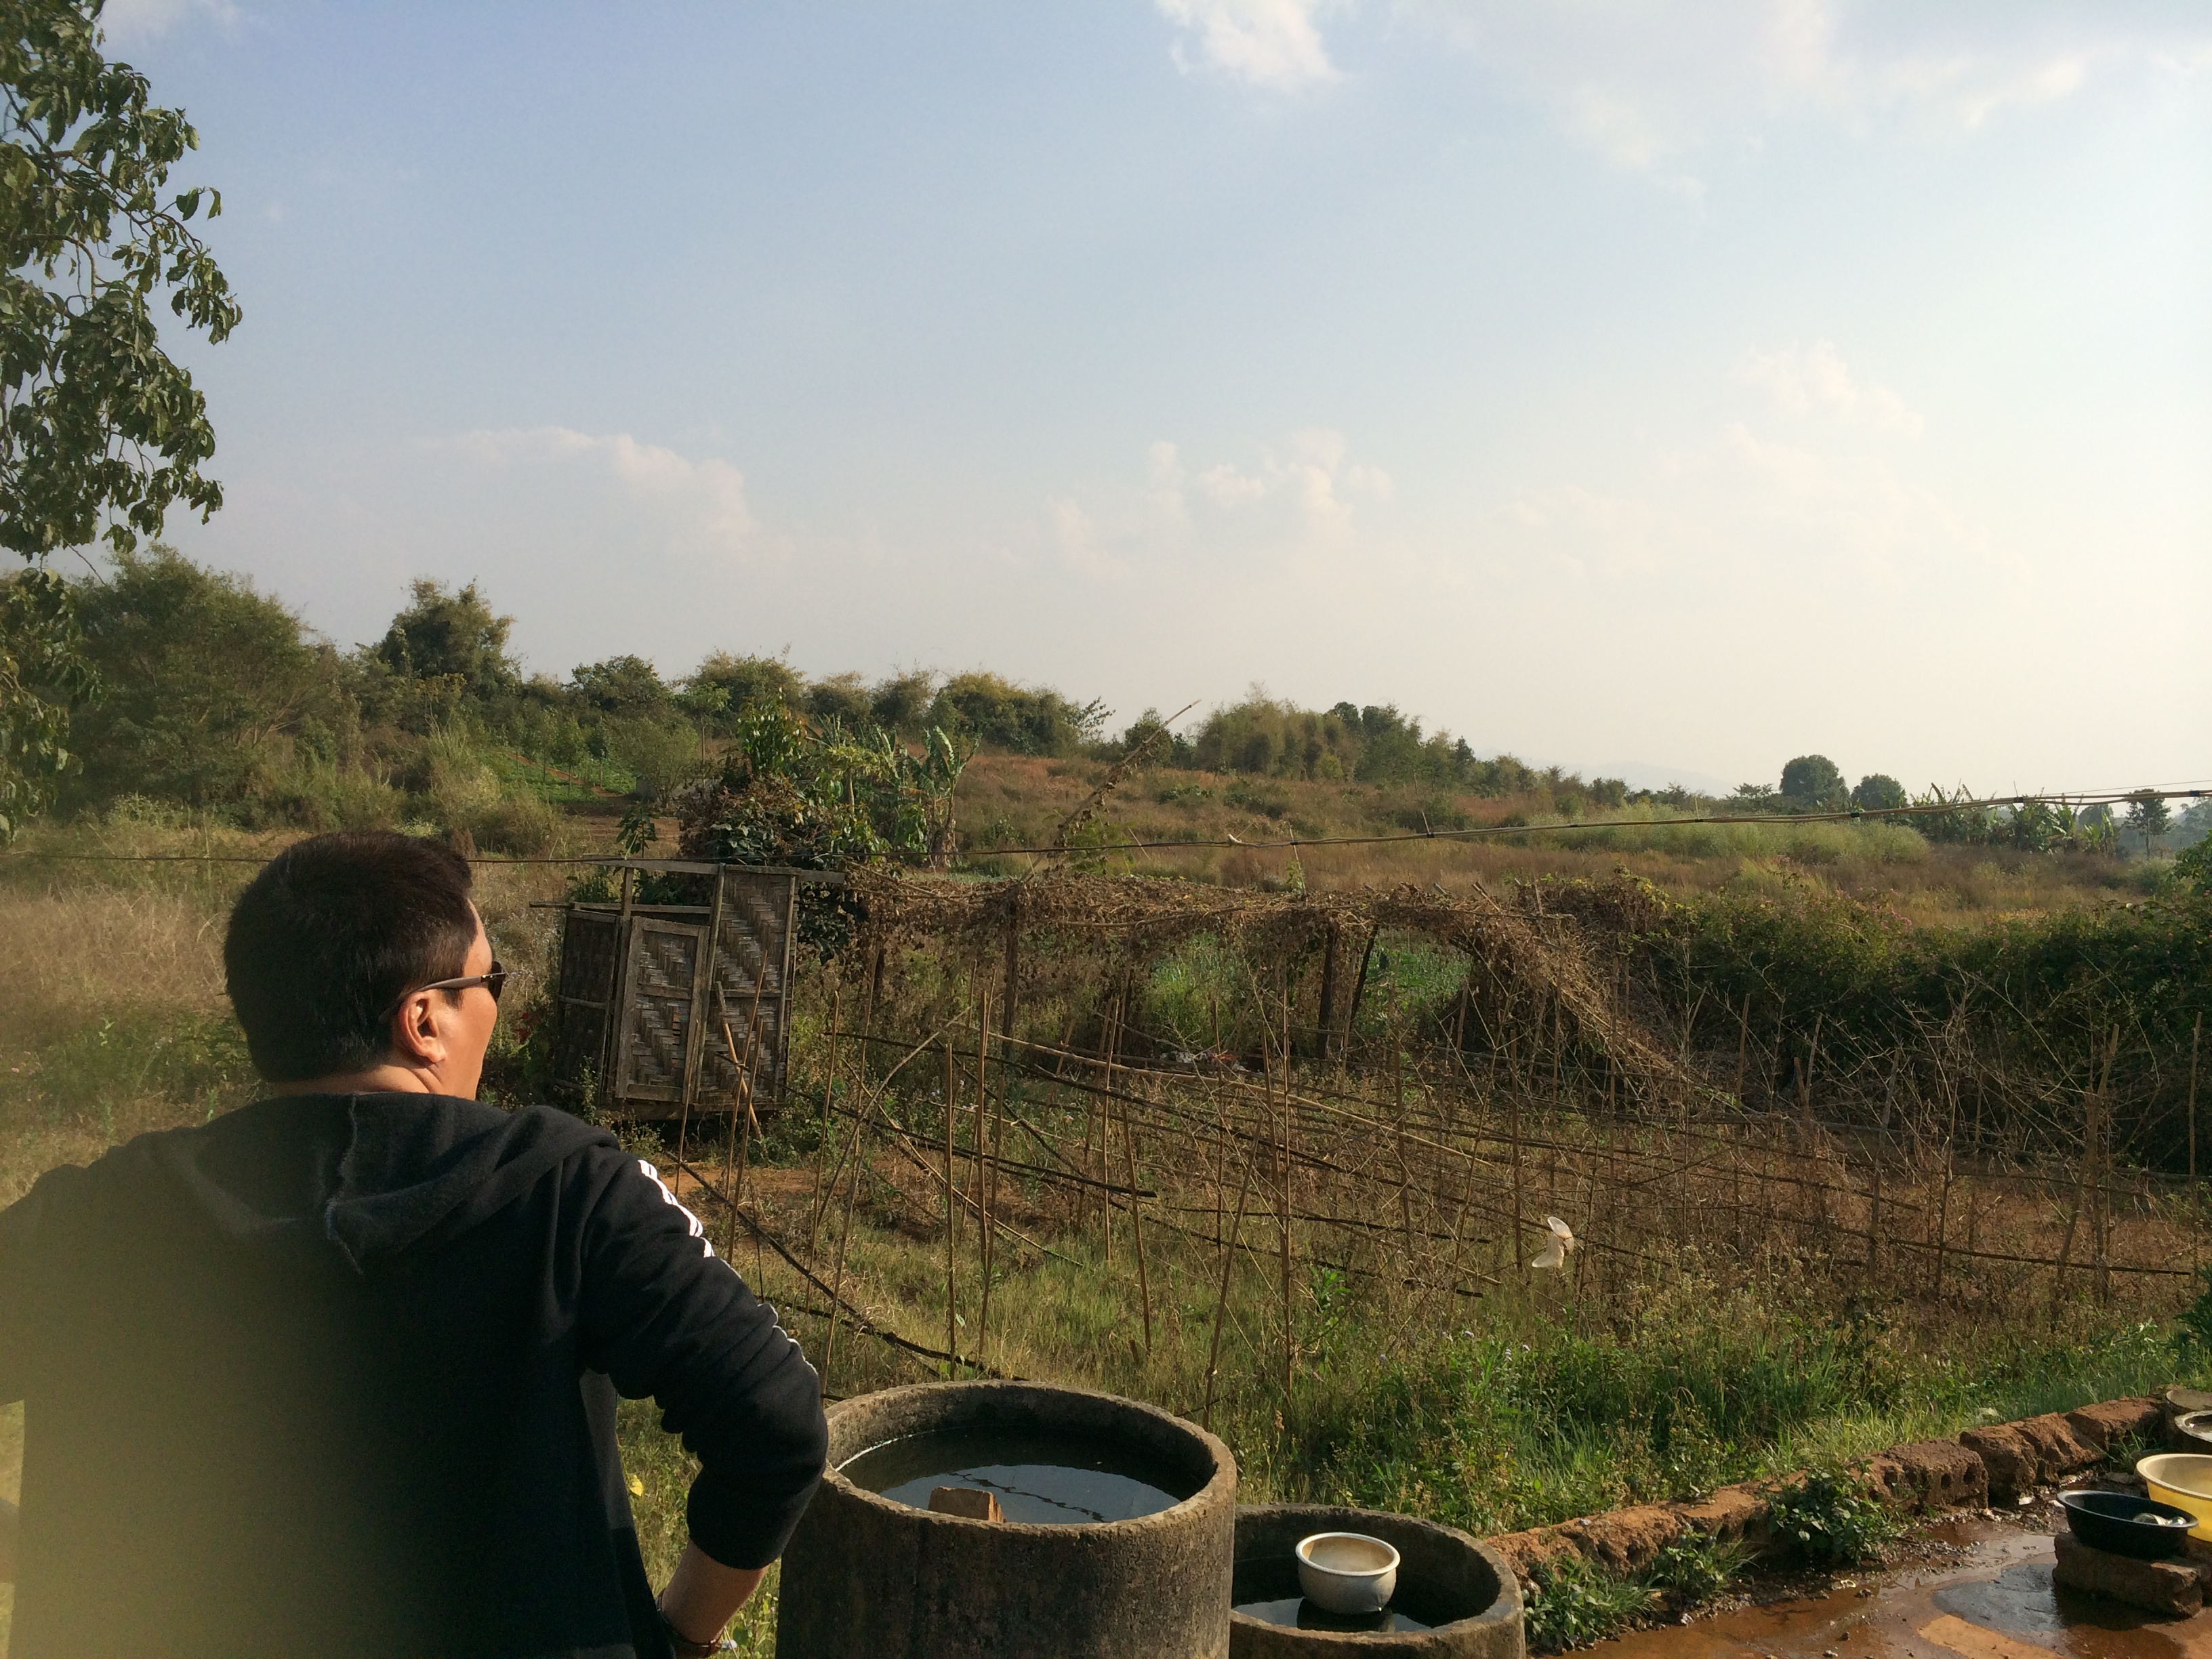 Pyin Oo Lwin の、緑の広がるのどかな景色